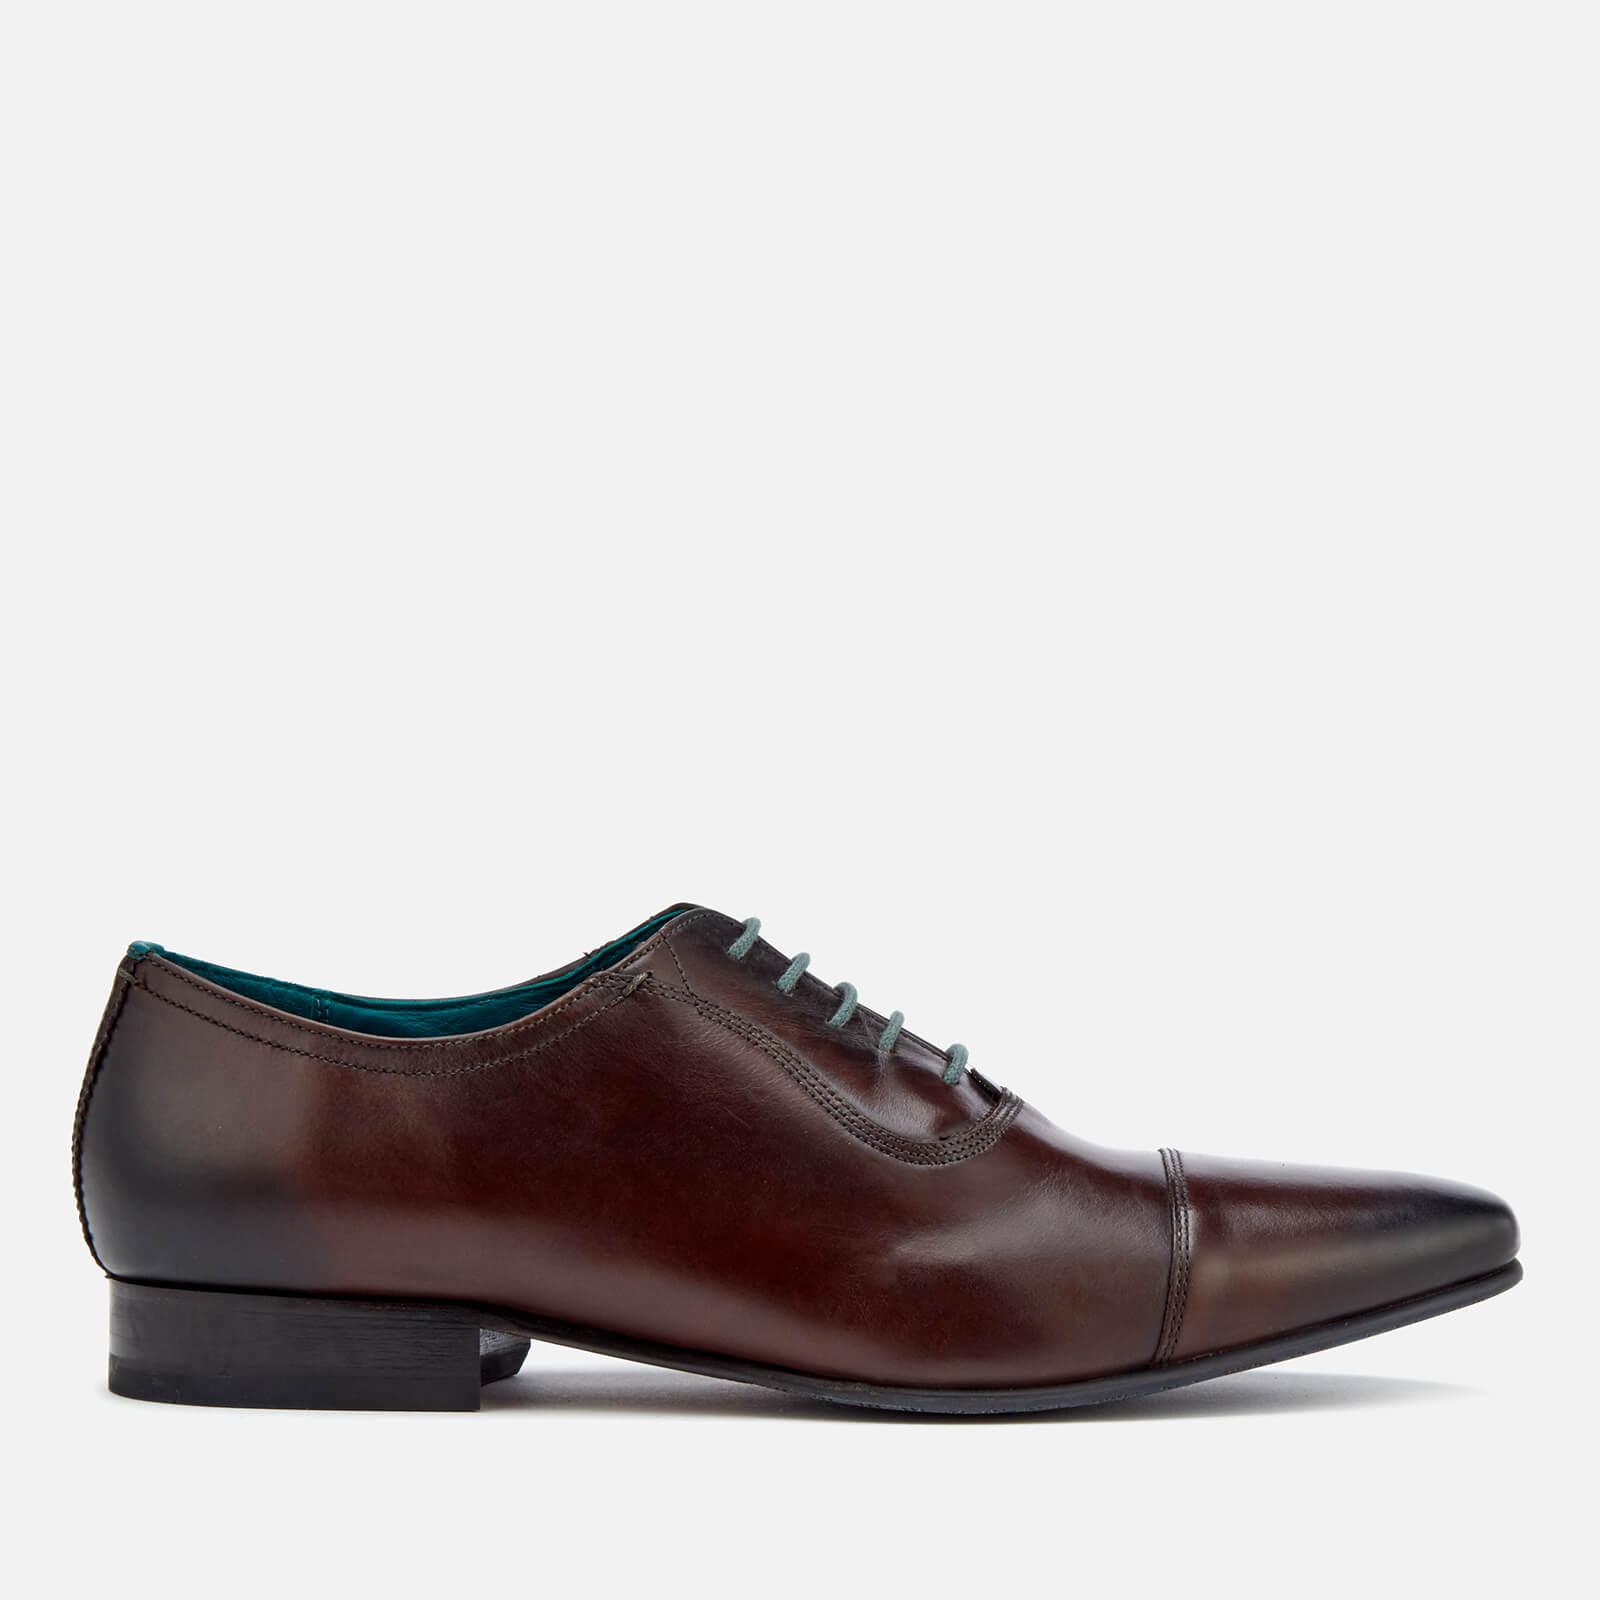 Ted Baker Men's Karney Leather Toe-Cap Oxford Shoes - Brown - UK 8